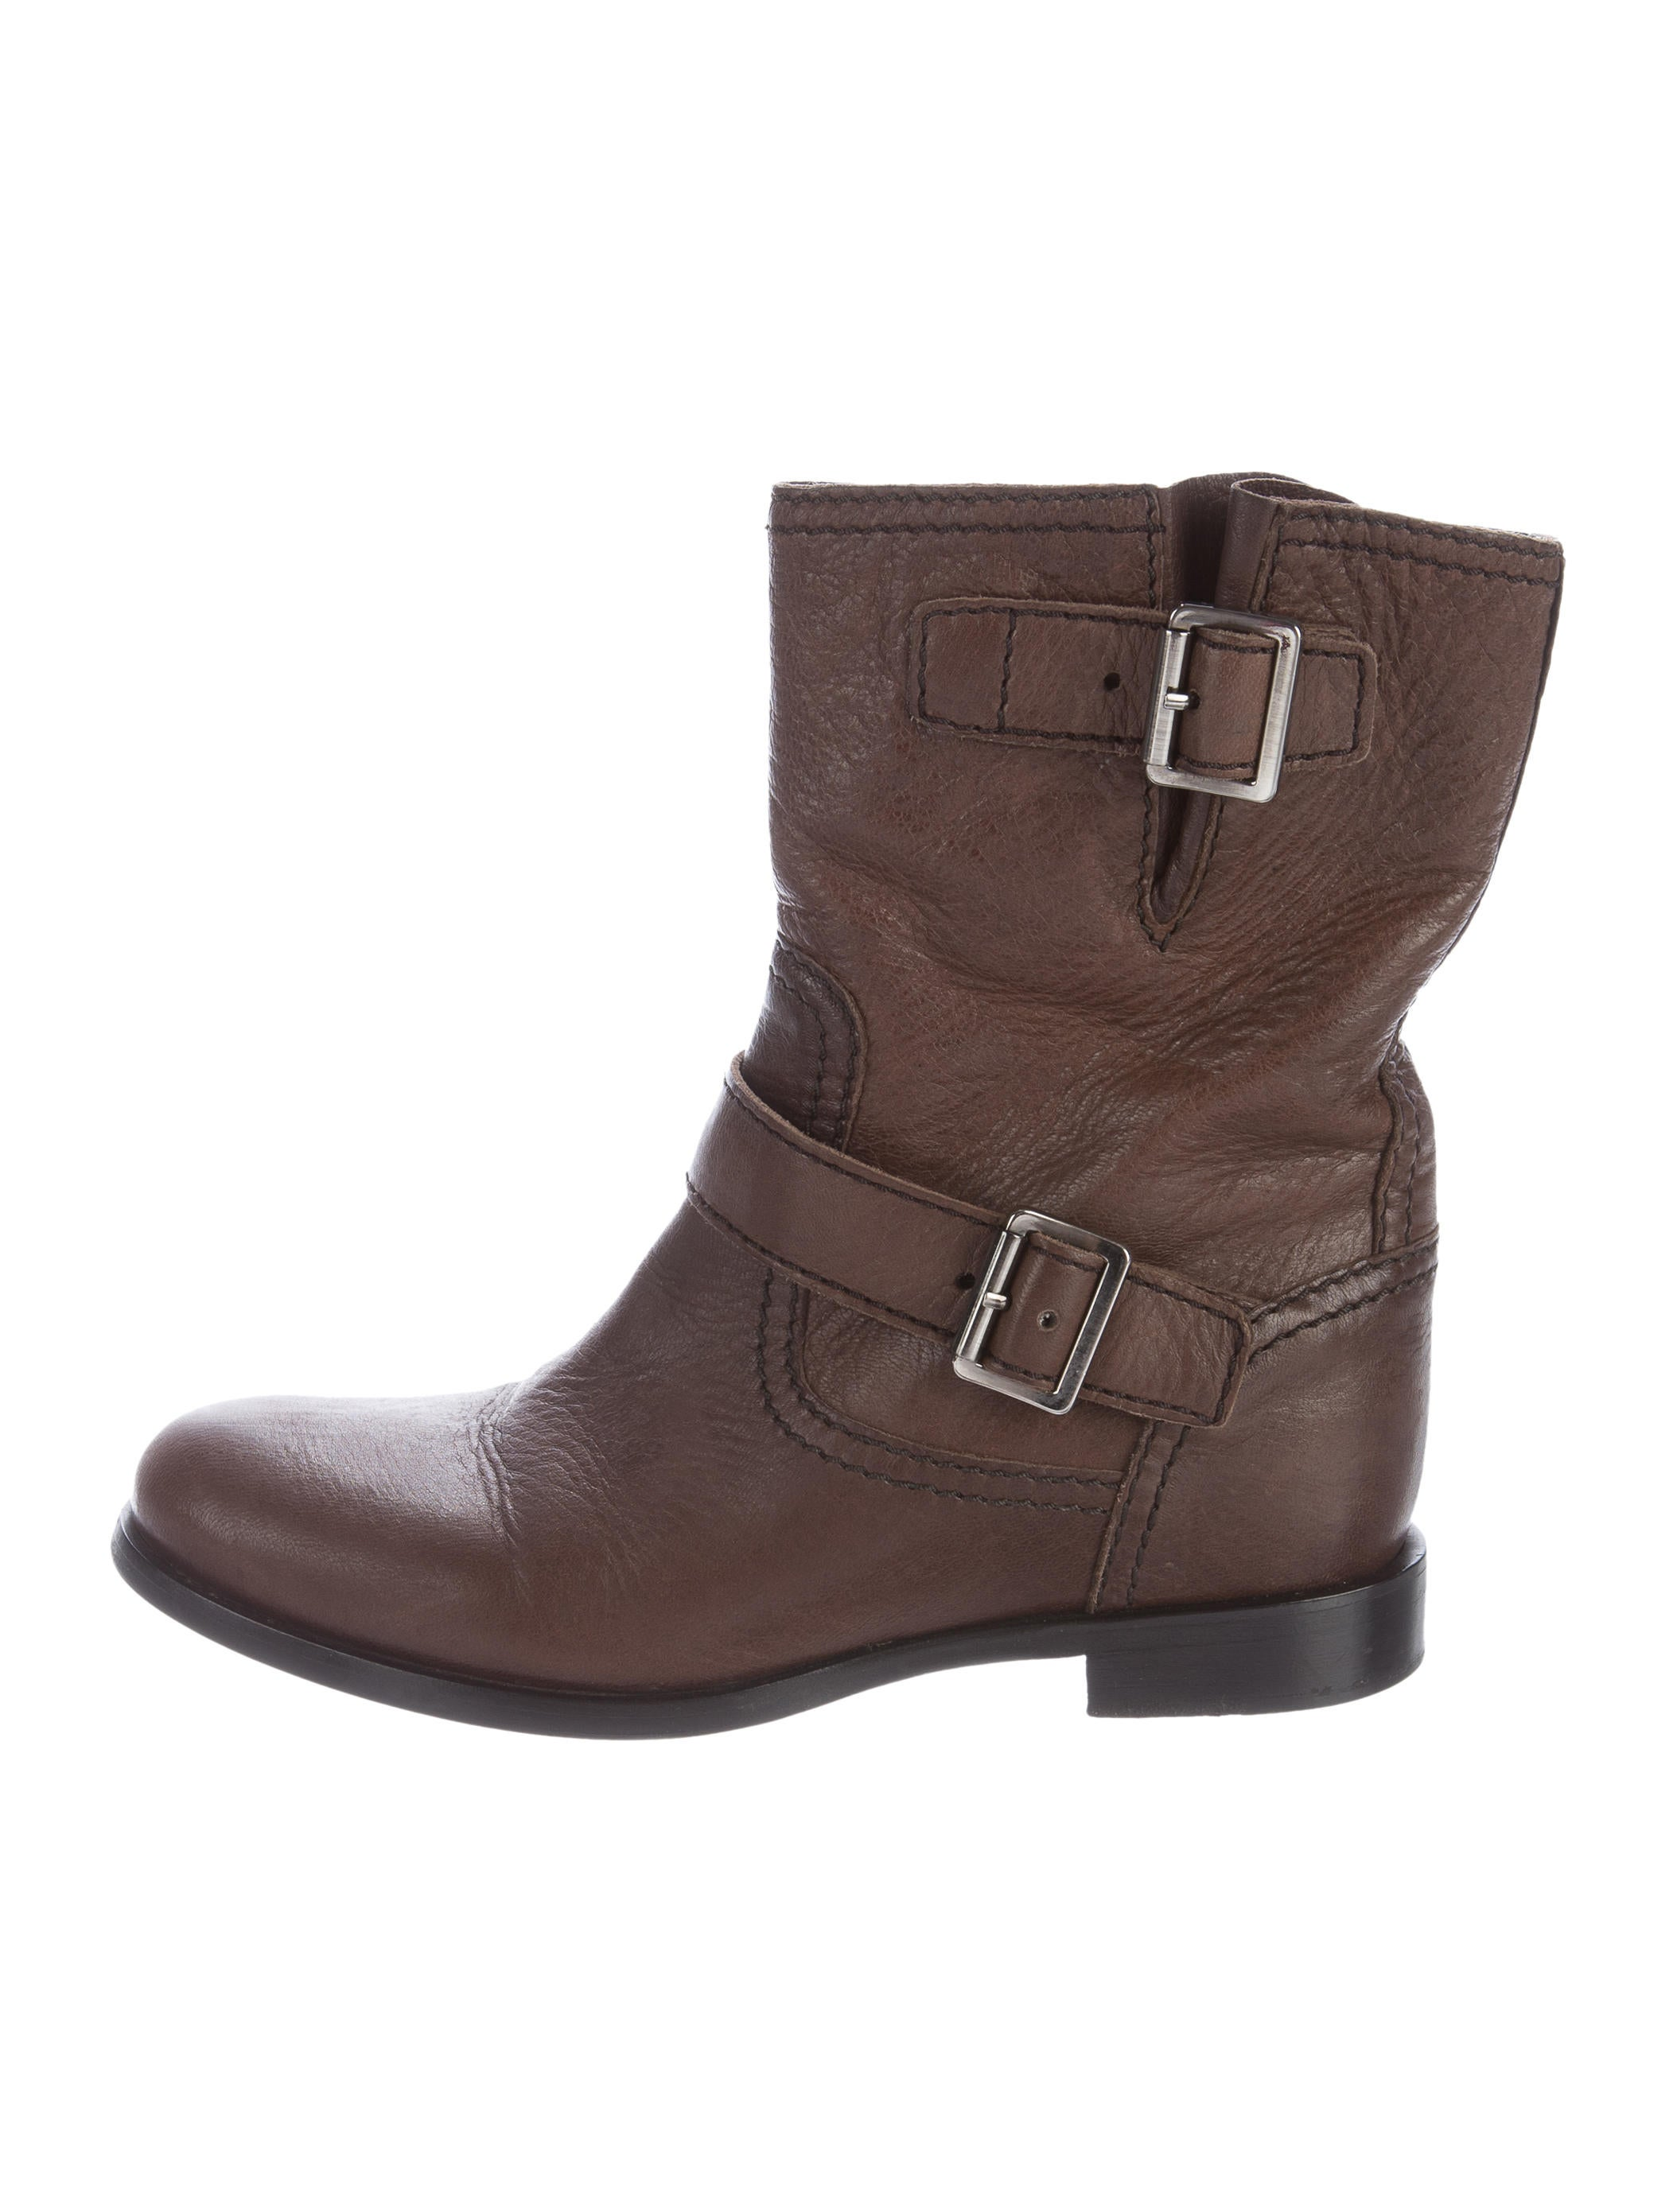 prada leather moto boots shoes pra142090 the realreal